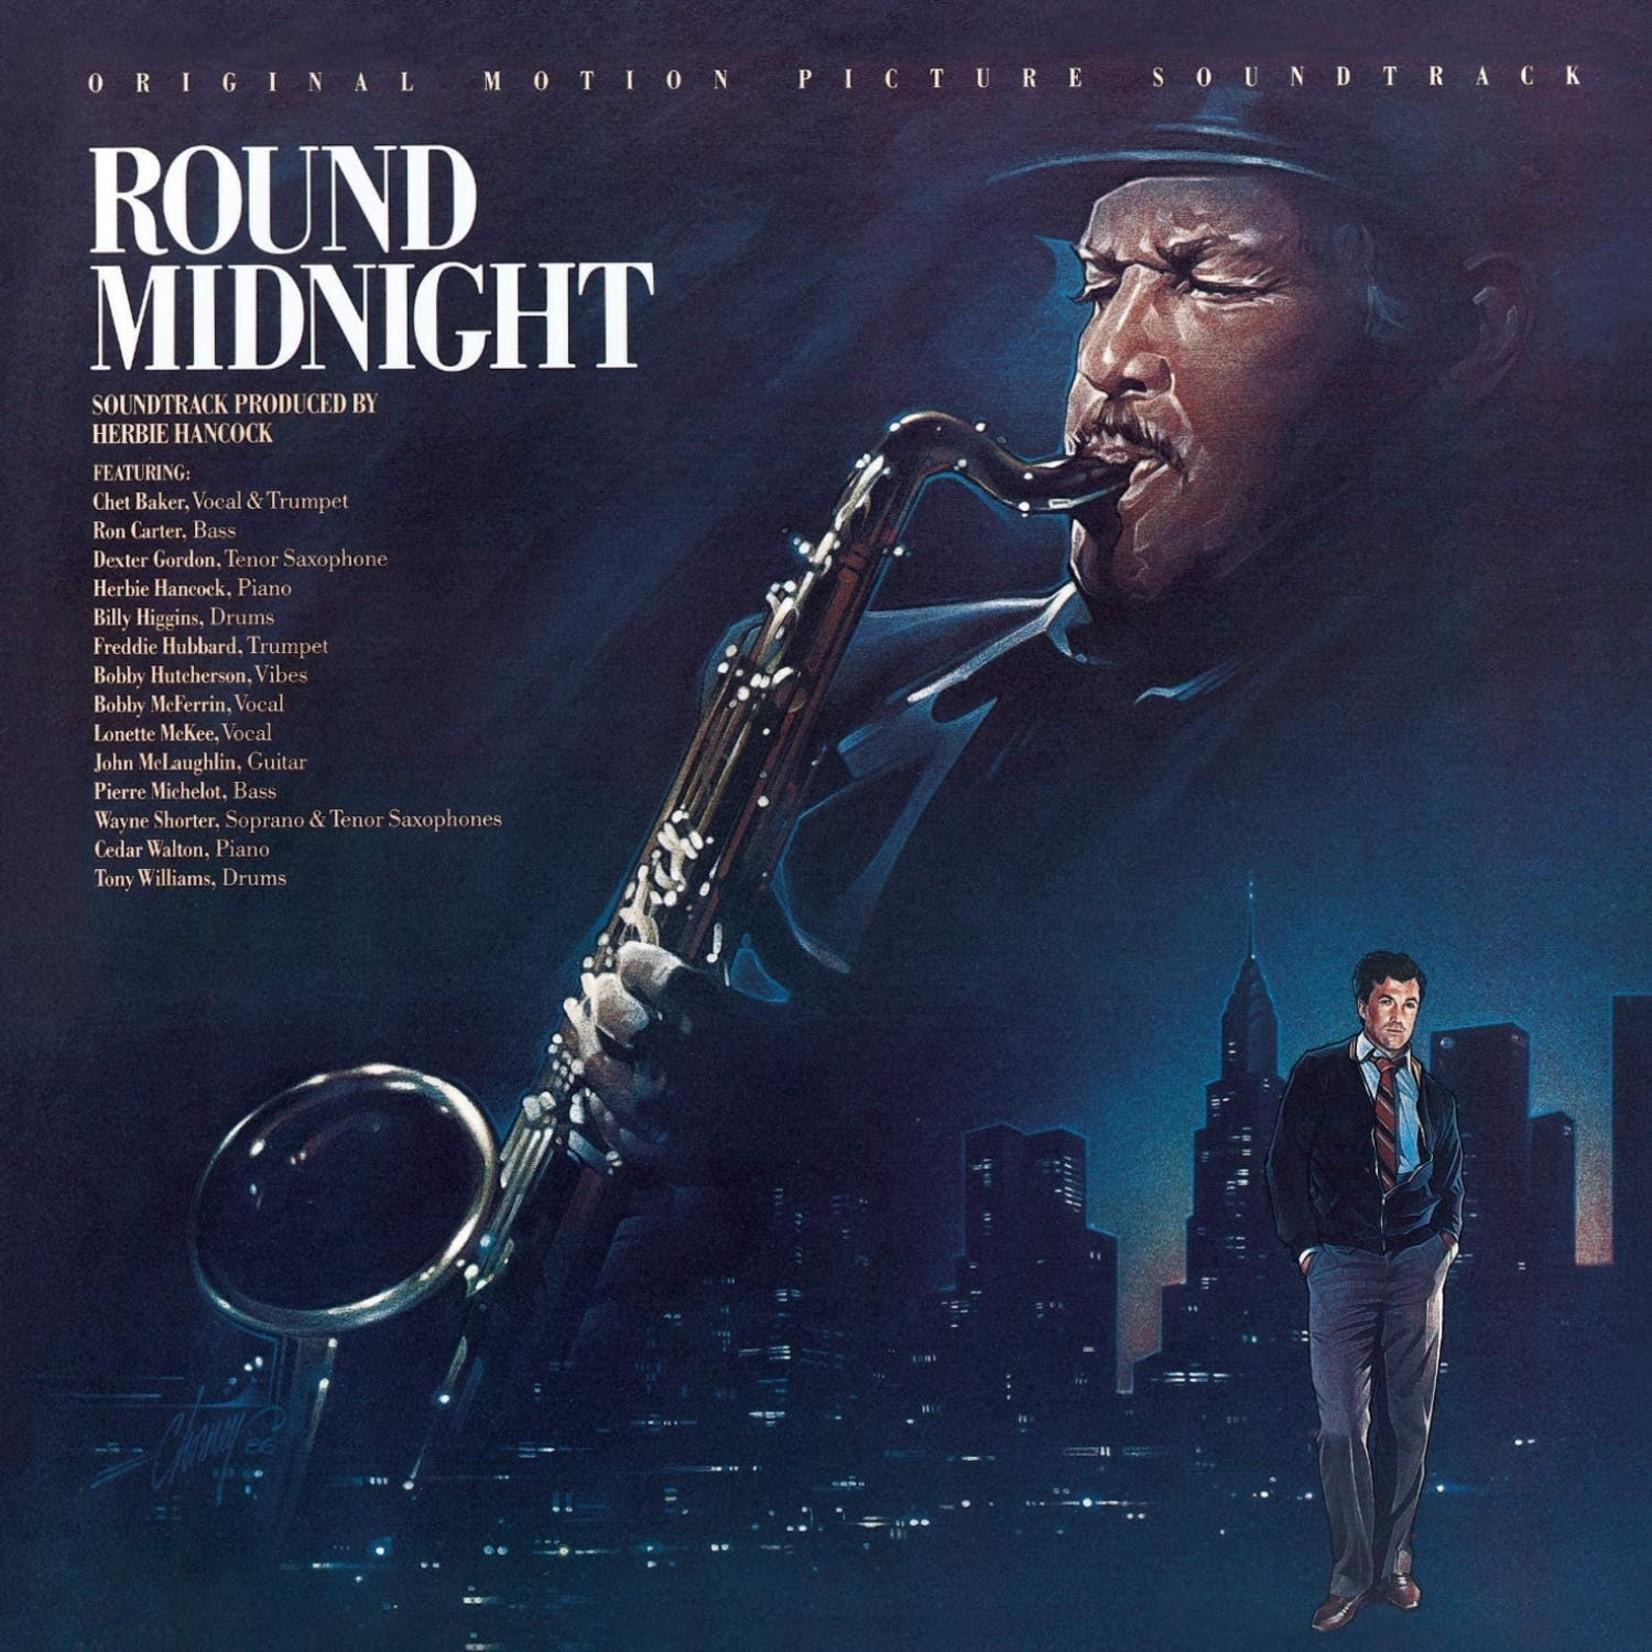 [Vintage] Hancock, Herbie: Round Midnight (Soundtrack)